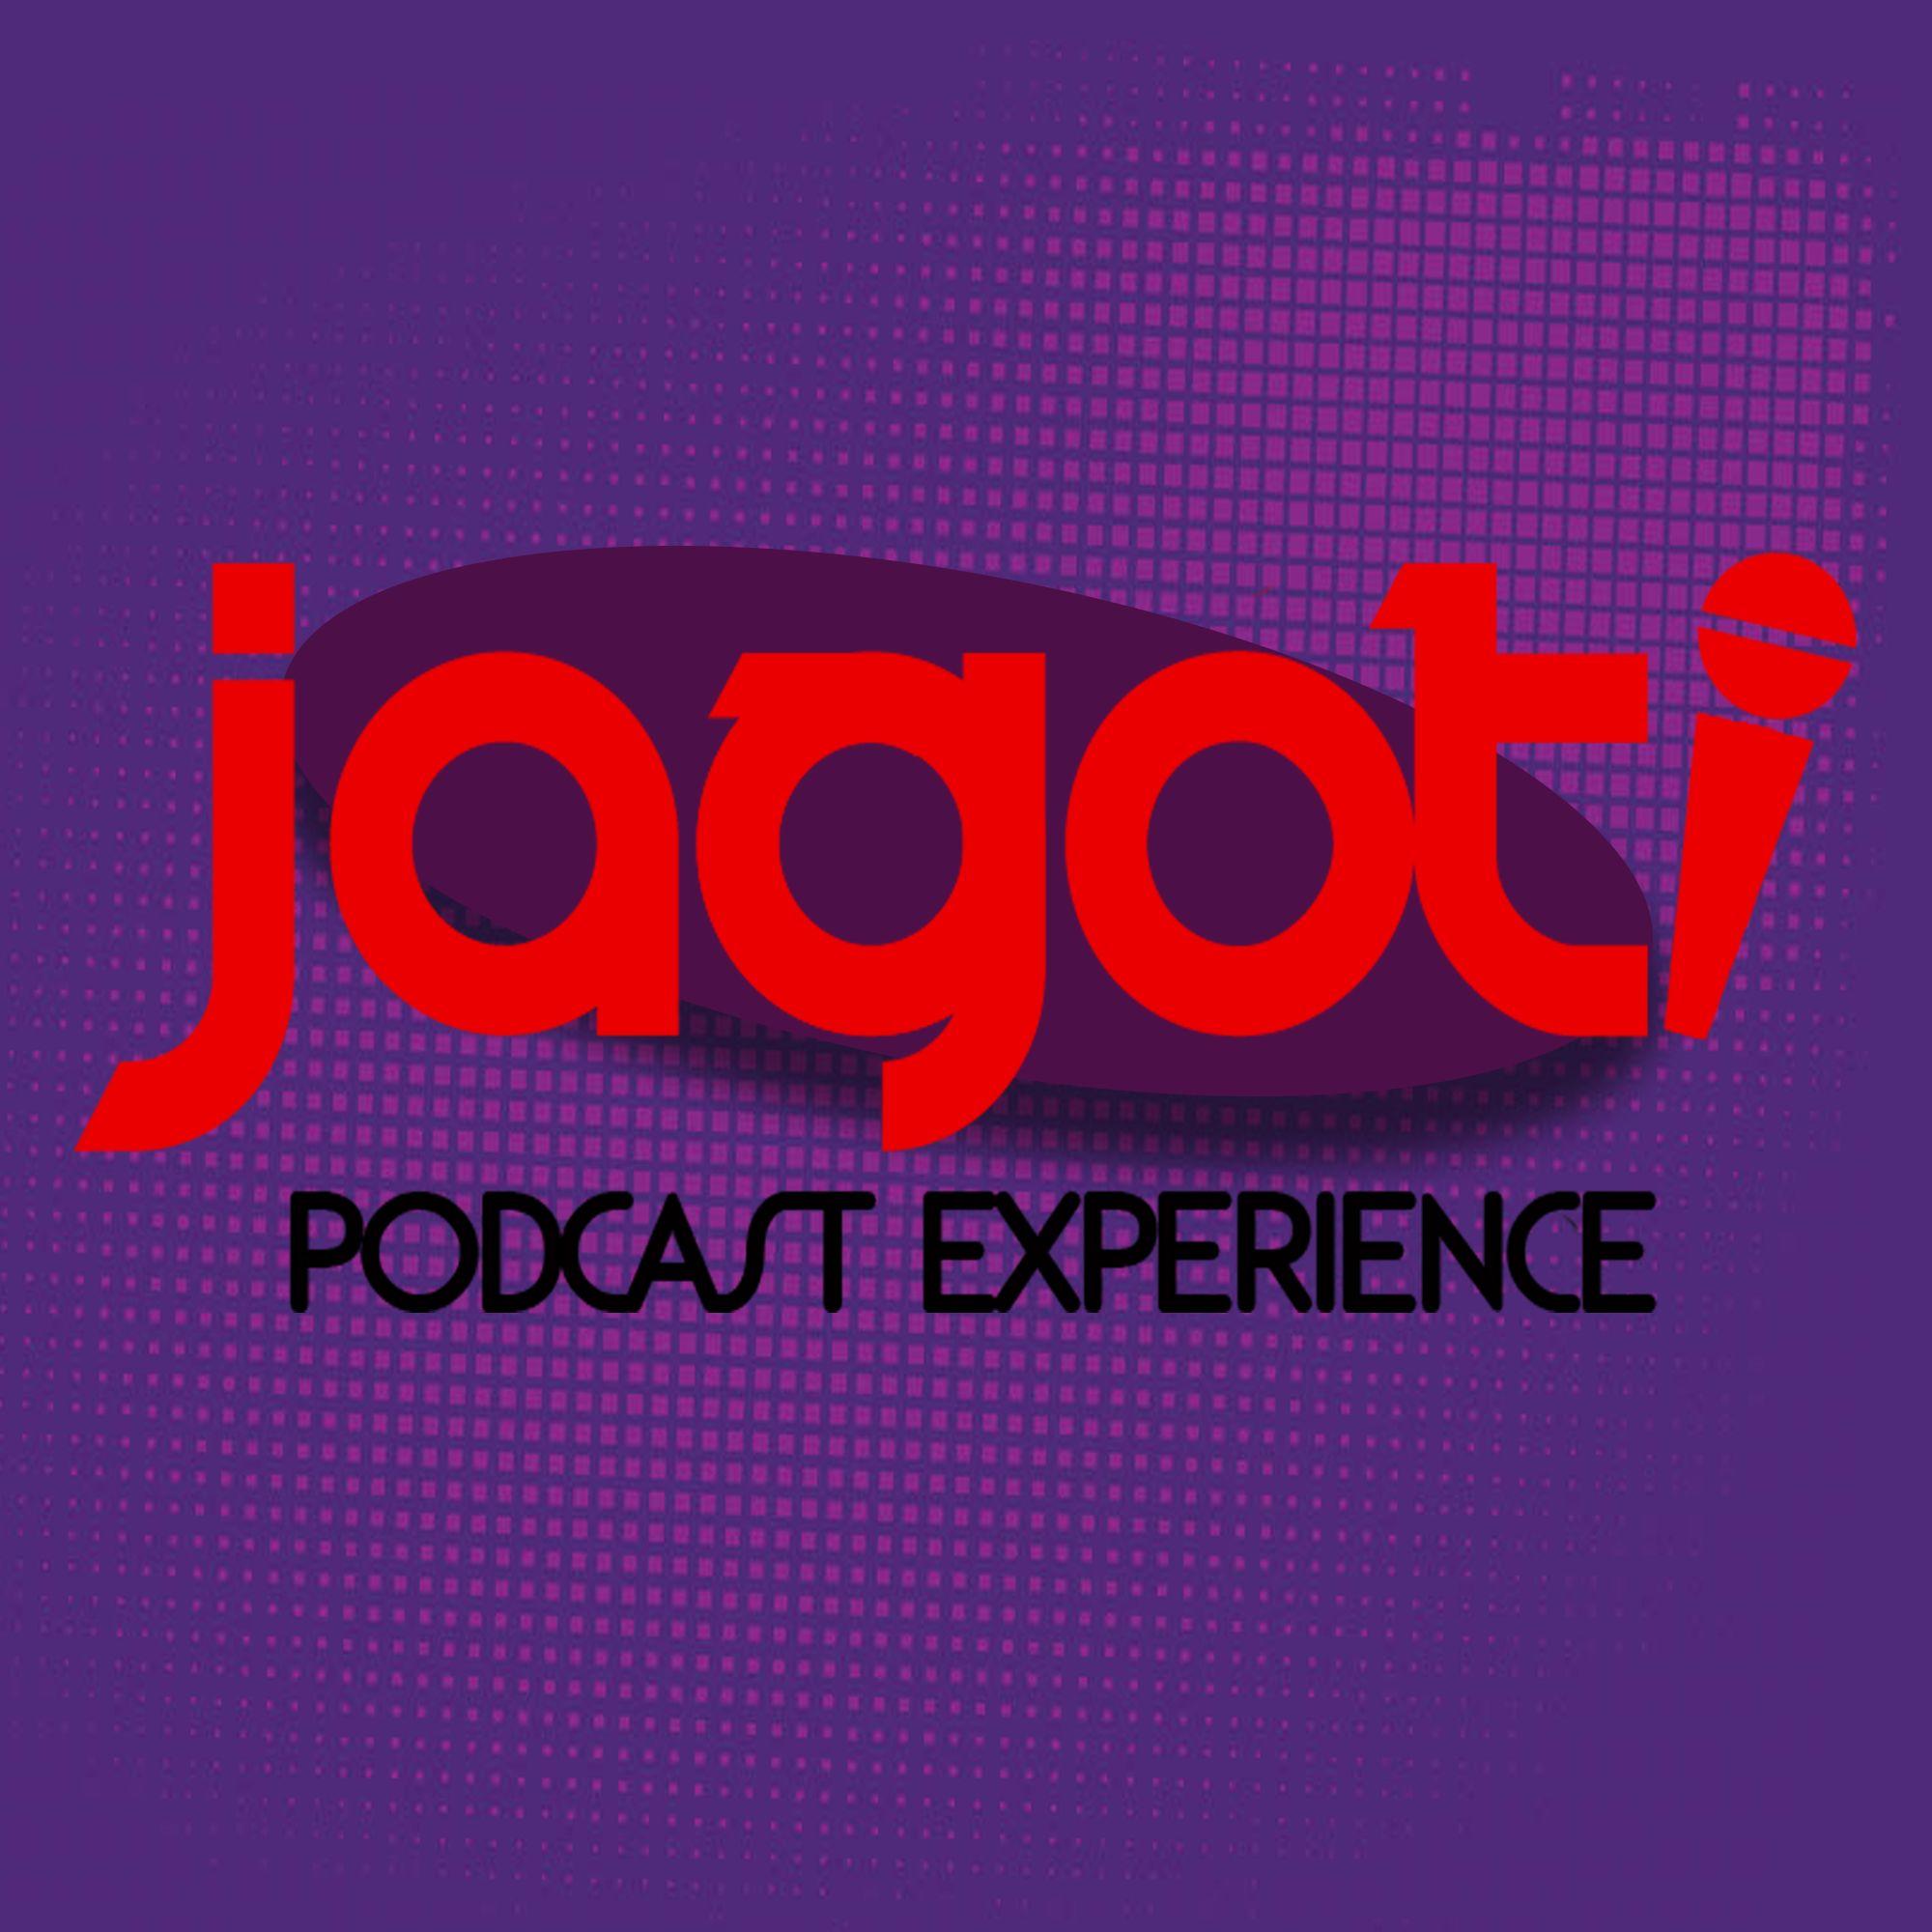 Jagoti Podcast Experience